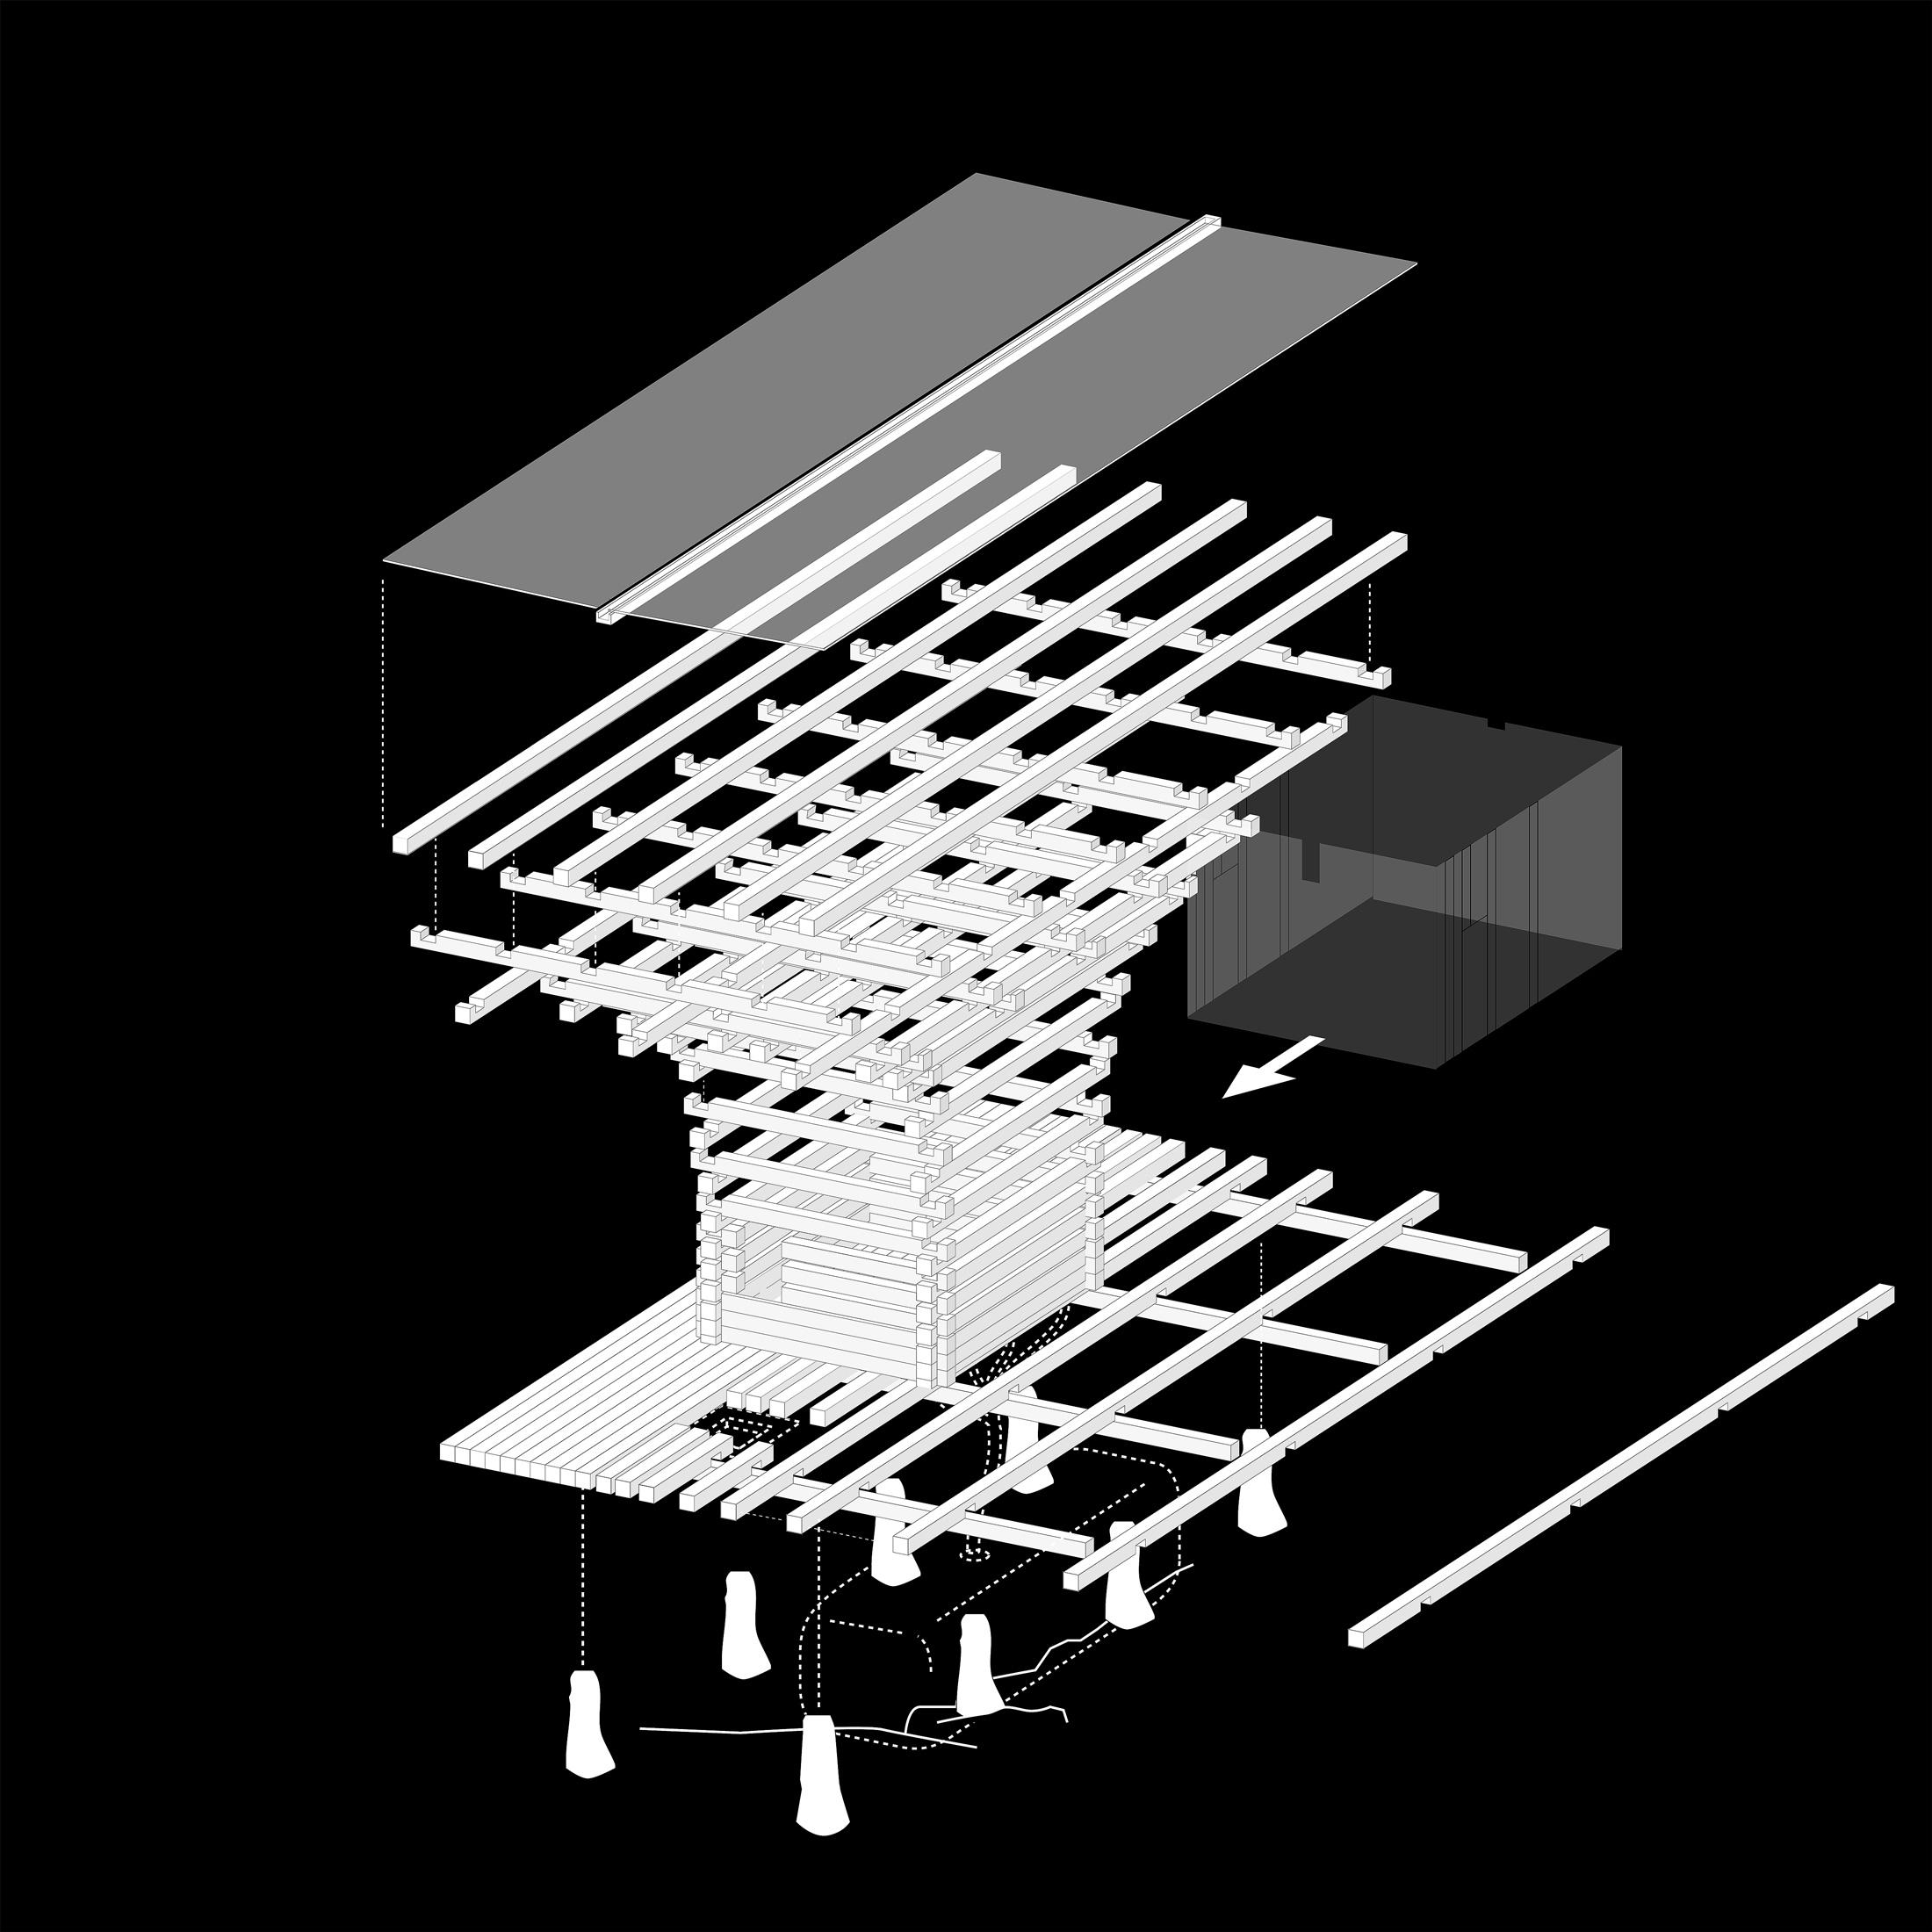 Skomakerdiket, Skomakerriket, AFK, Arkitketur, Arkitekt, Knut Folstad, Laft, Byggeskikk, Moderne, Tre, Varmestue, Bergen, Fjell, Norway, Mountain, Architecture